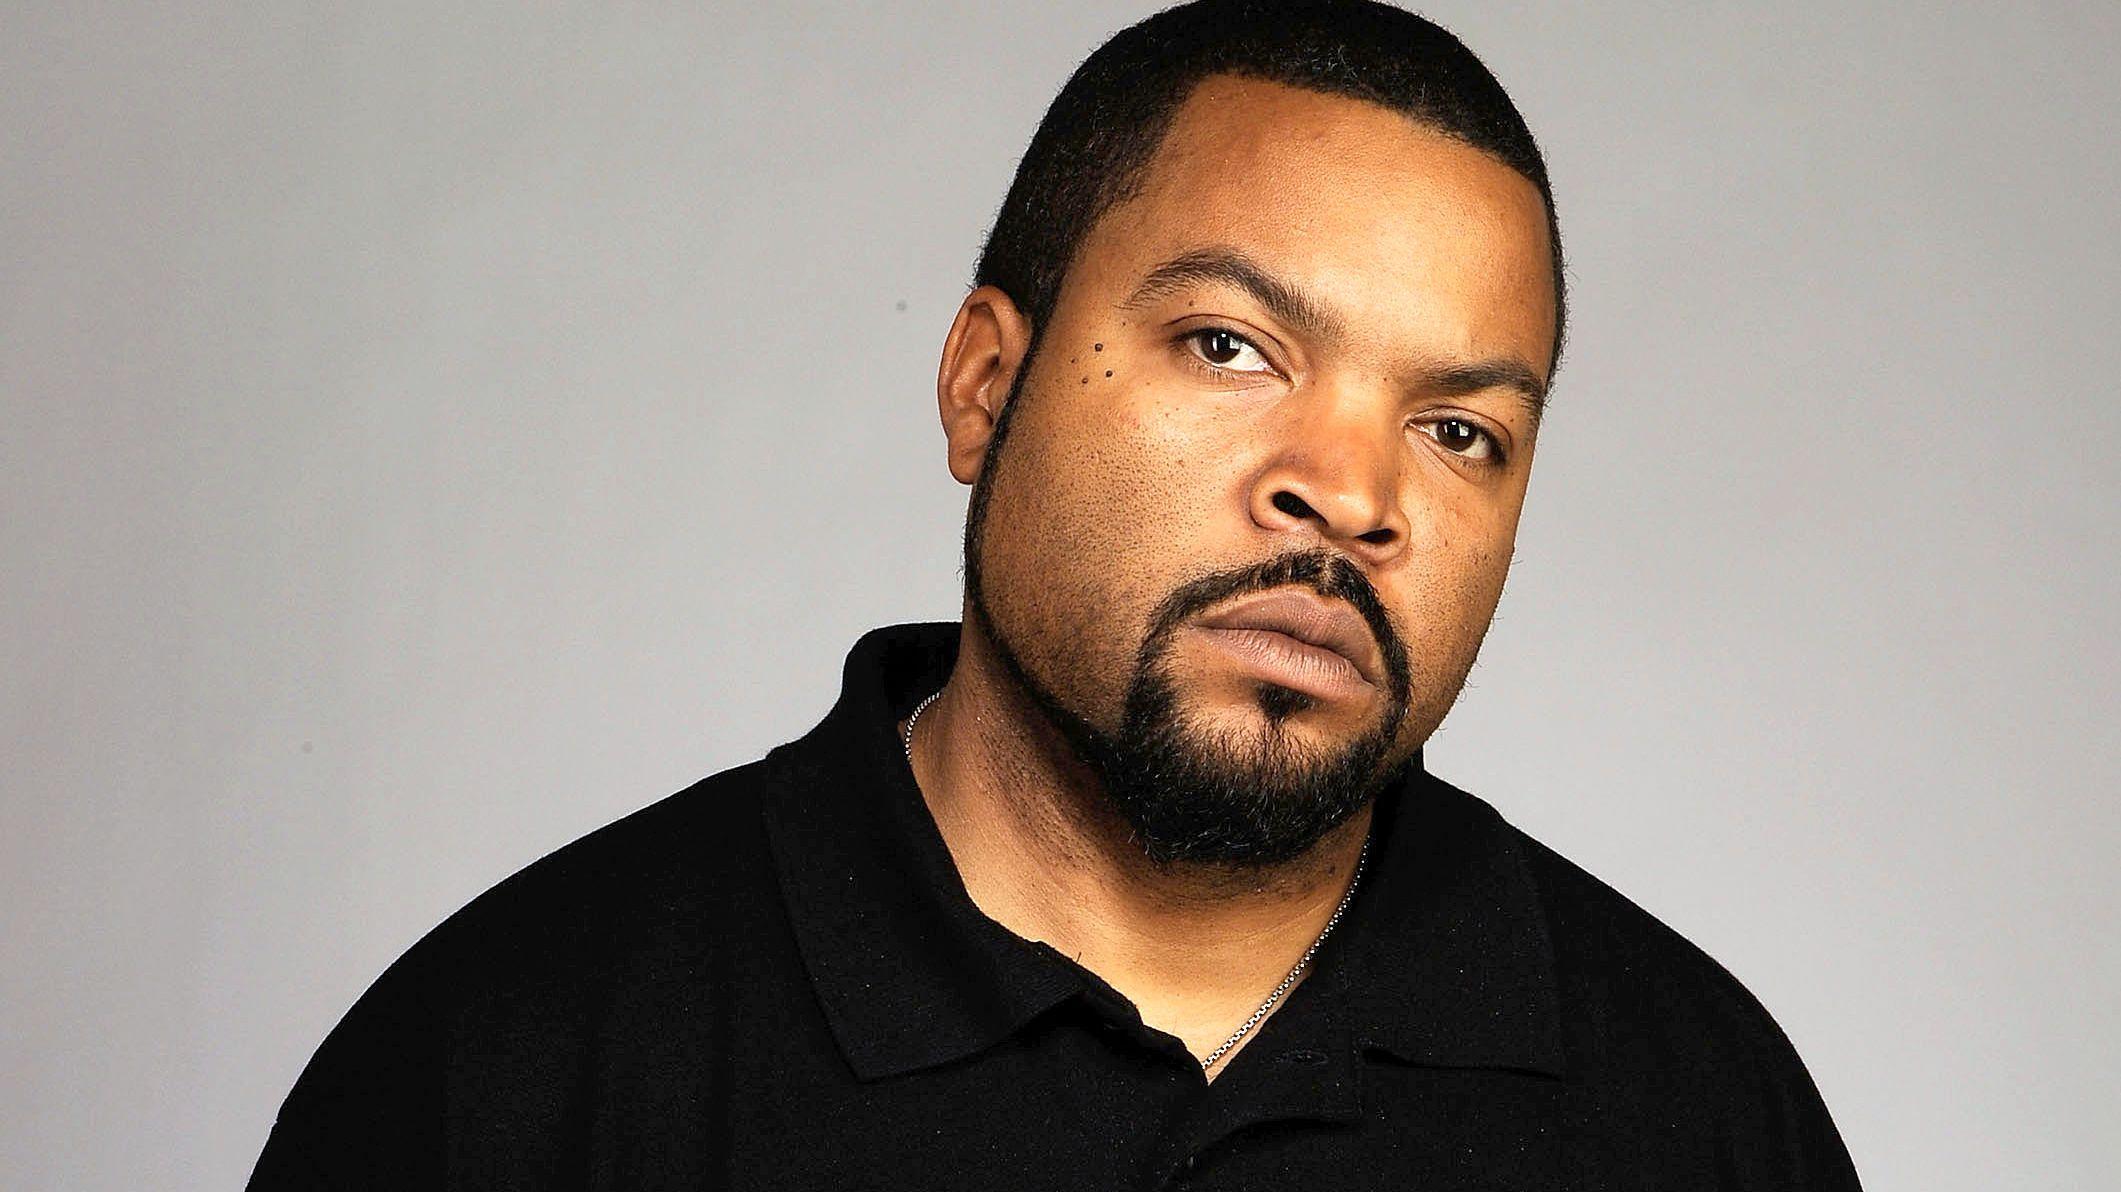 Copy of Ice Cube